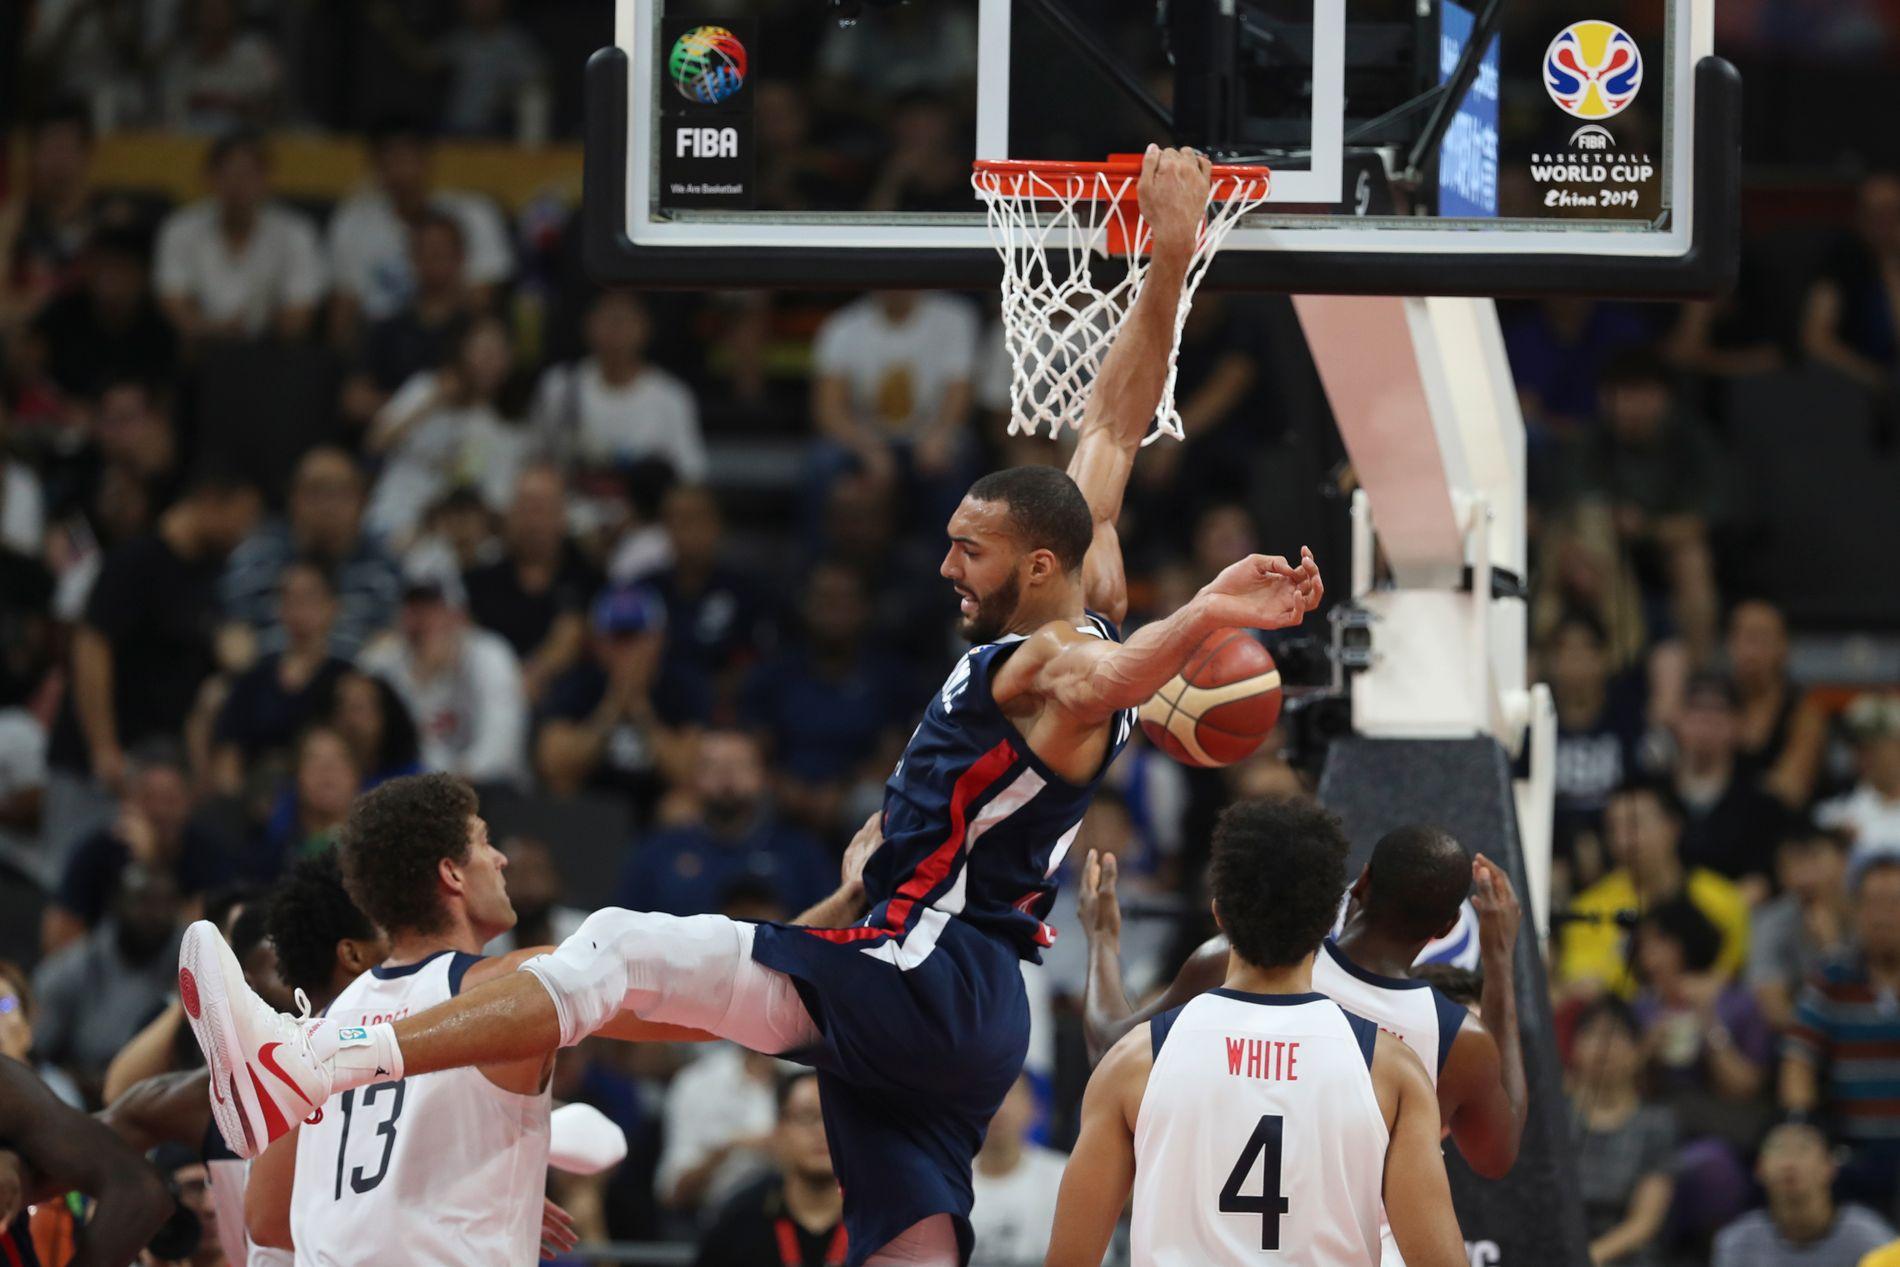 USAs basketballherrer ble ydmyket i kvartfinalen under VM i Kina.